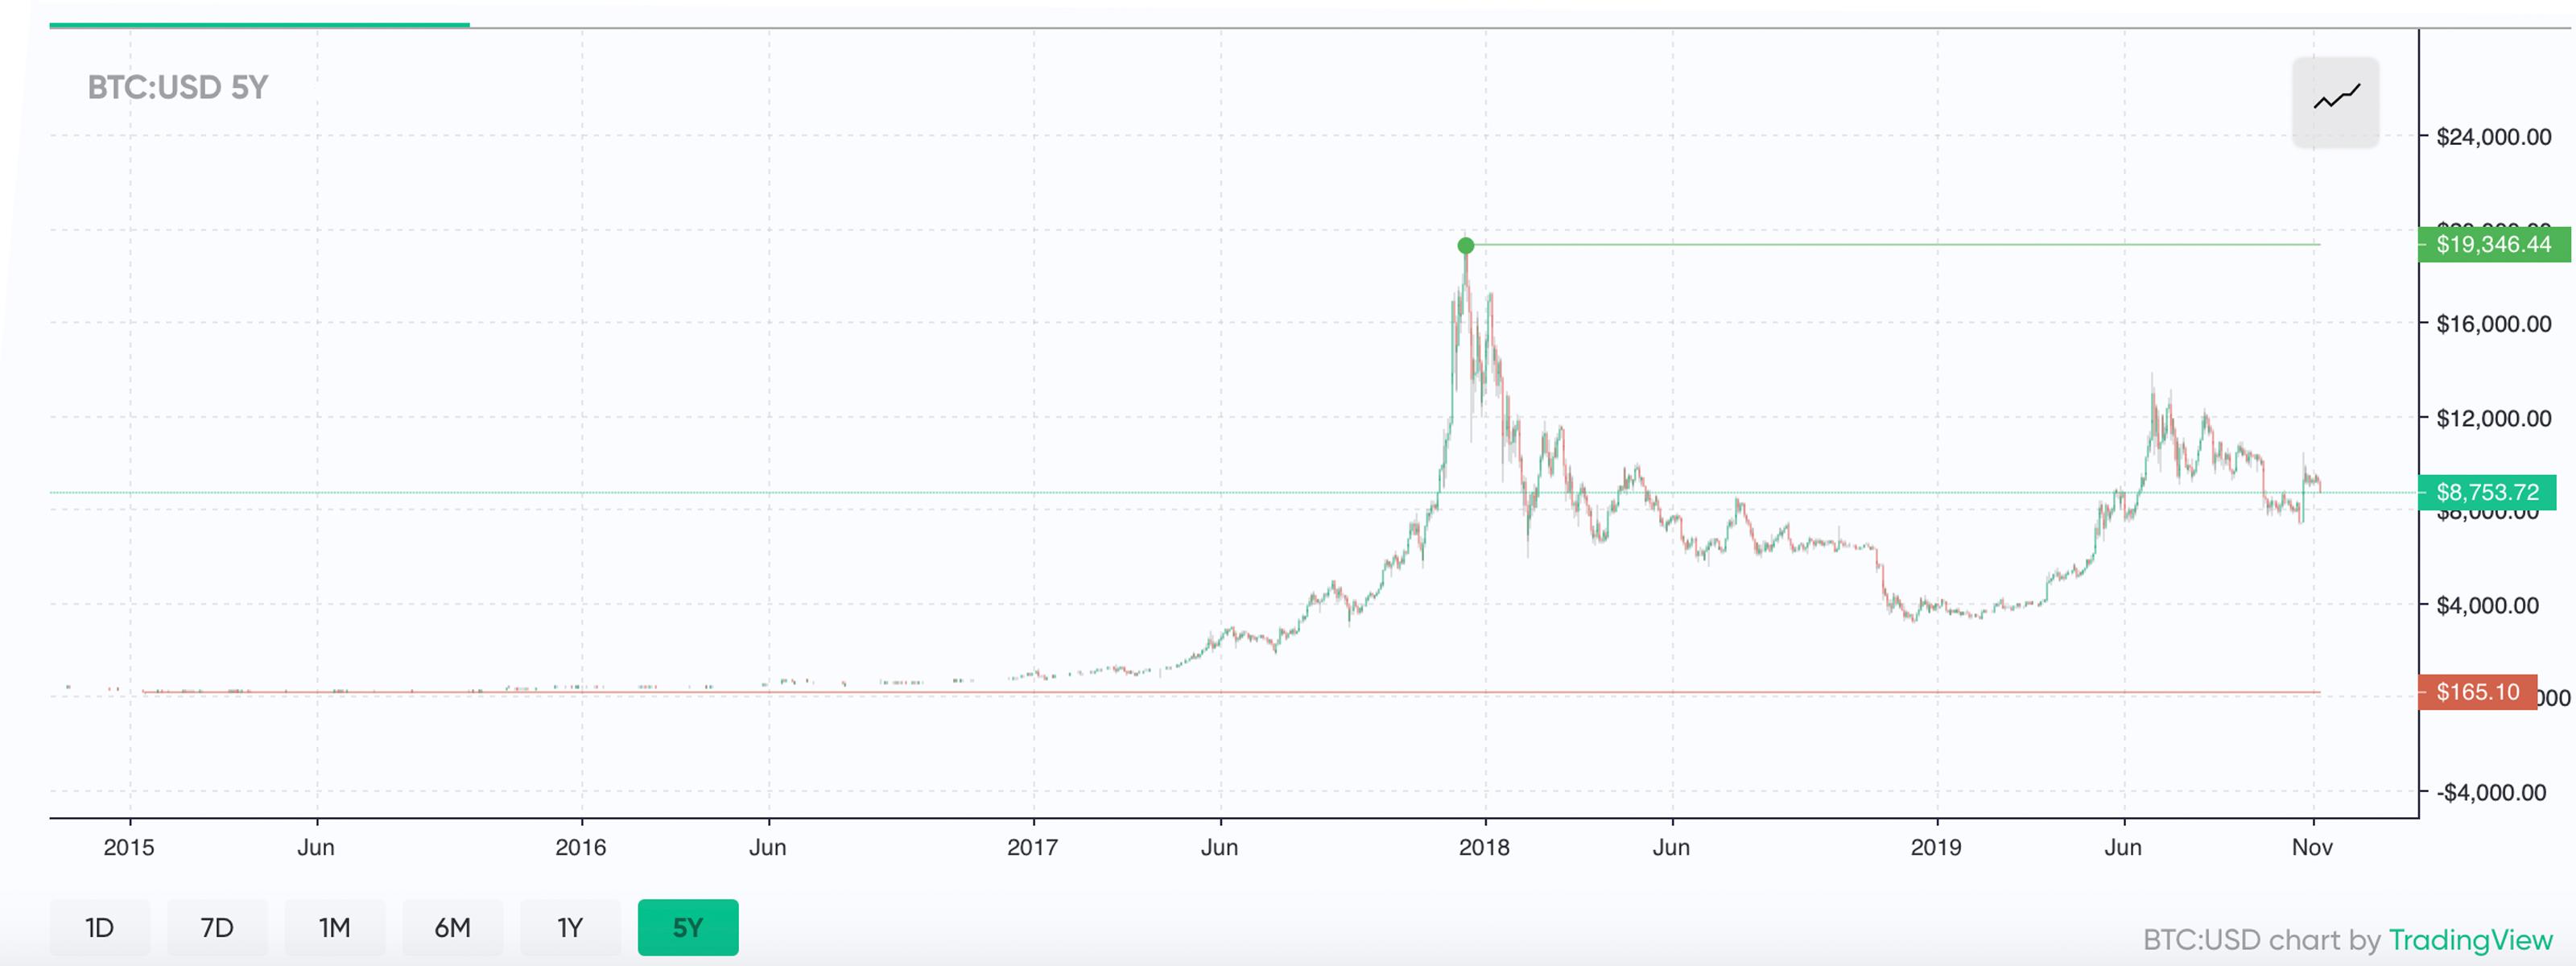 "Cómo se comparan las criptomonedas del pasado de Bitcoin con las de hoy ""ancho ="" 3200 ""altura ="" 1200 ""srcset ="" https://blackswanfinances.com/wp-content/uploads/2019/11/btcusd5y.jpg 3200w, https://news.bitcoin.com/wp-content/uploads/2019/11/btcusd5y -300x113.jpg 300w, https://news.bitcoin.com/wp-content/uploads/2019/11/btcusd5y-768x288.jpg 768w, https://news.bitcoin.com/wp-content/uploads/2019 /11/btcusd5y-1024x384.jpg 1024w, https://news.bitcoin.com/wp-content/uploads/2019/11/btcusd5y-696x261.jpg 696w, https://news.bitcoin.com/wp-content /uploads/2019/11/btcusd5y-1392x522.jpg 1392w, https://news.bitcoin.com/wp-content/uploads/2019/11/btcusd5y-1068x401.jpg 1068w, https://news.bitcoin.com /wp-content/uploads/2019/11/btcusd5y-1120x420.jpg 1120w ""tamaños ="" (ancho máximo: 3200px) 100vw, 3200px"